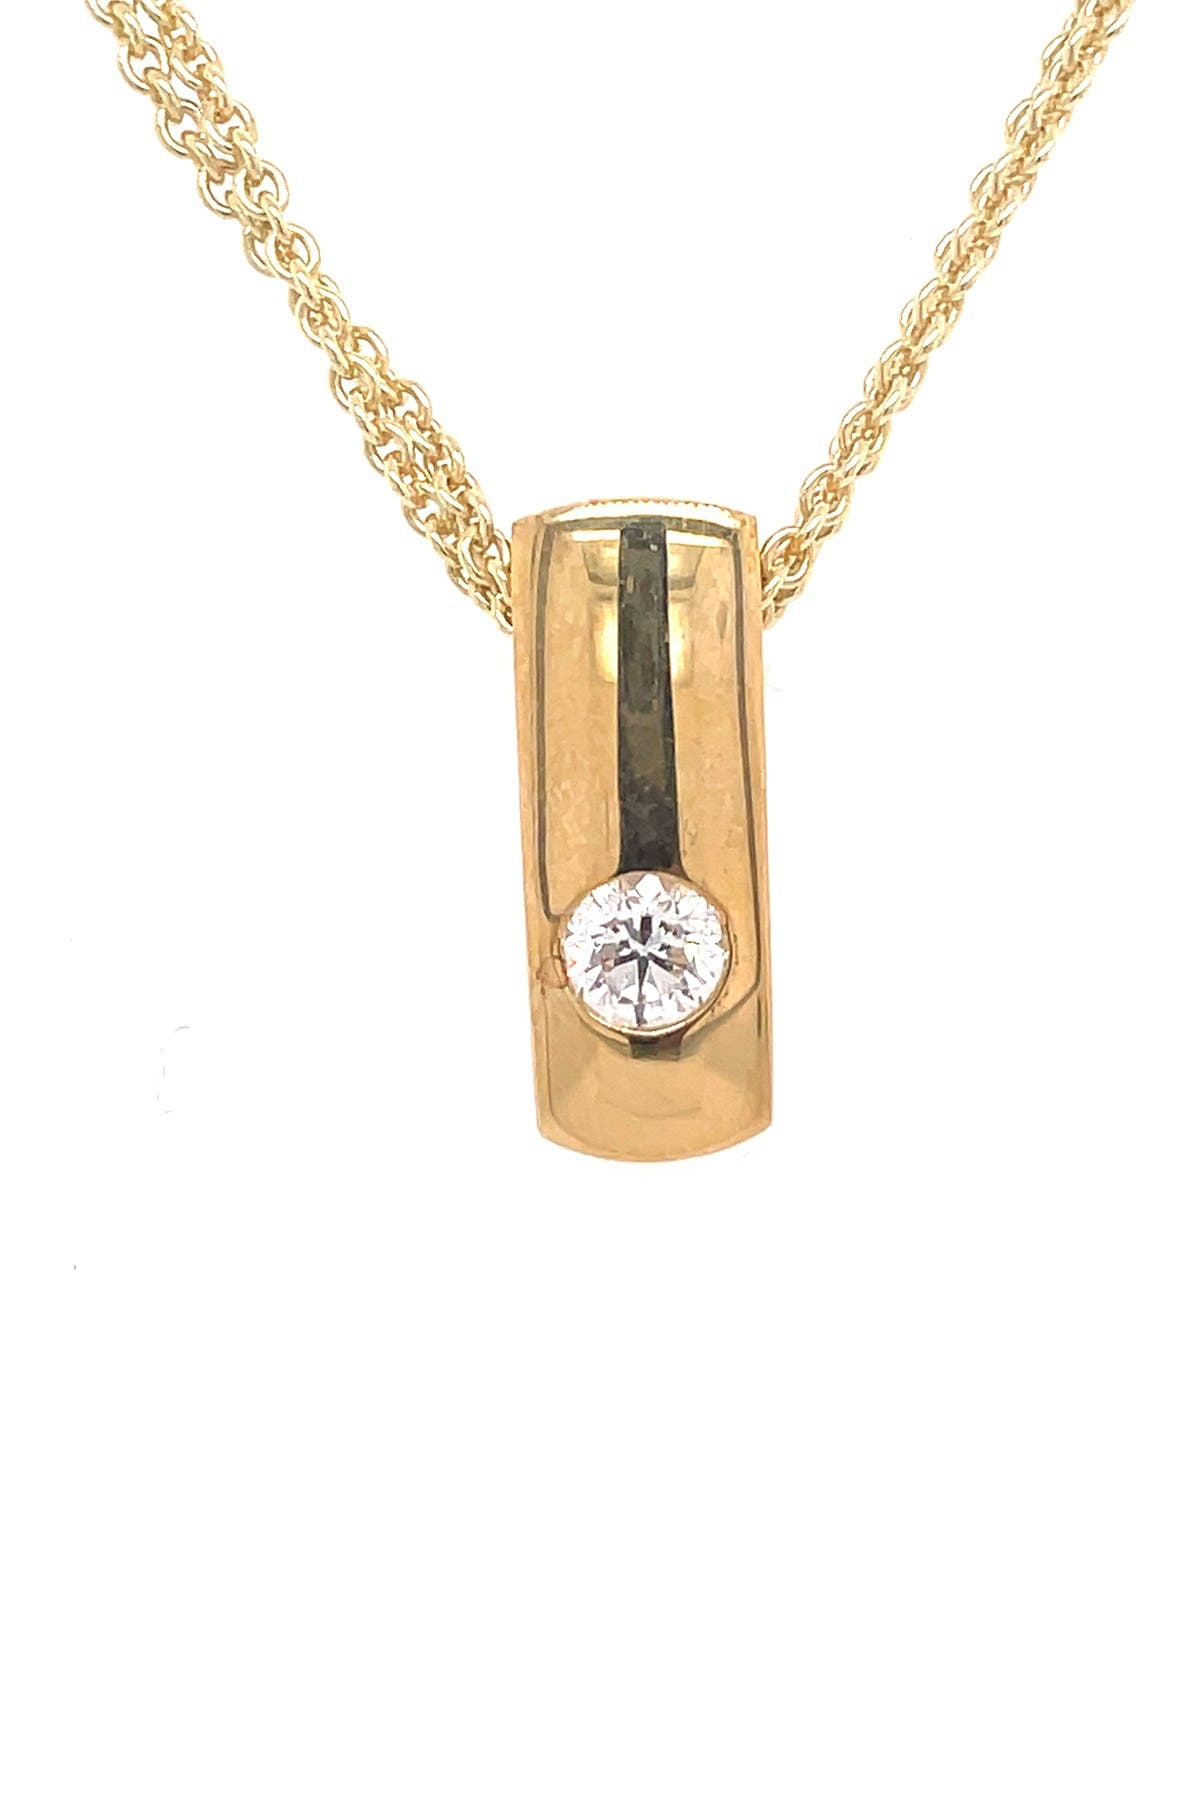 Image of BREUNING 14K Yellow Gold Flush Set Diamond Pendant Necklace - 0.32 ctw